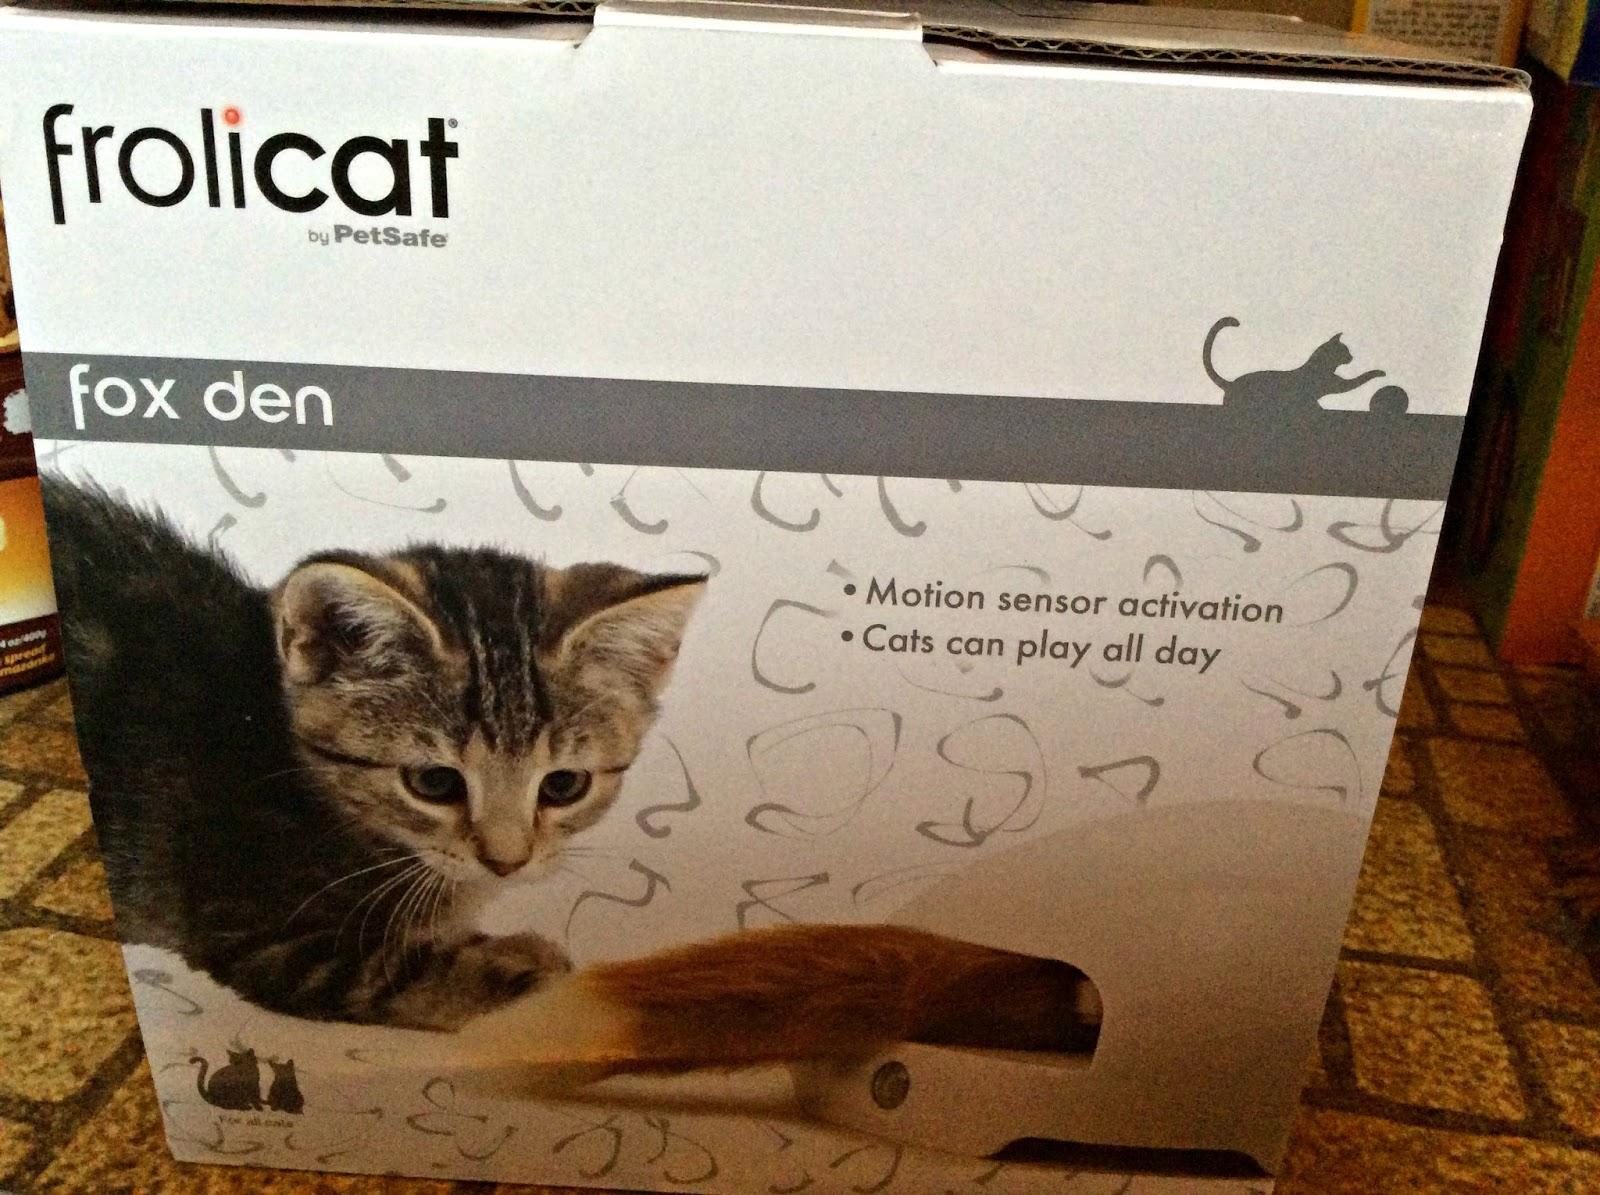 Frolicat Fox Den Cat Toy